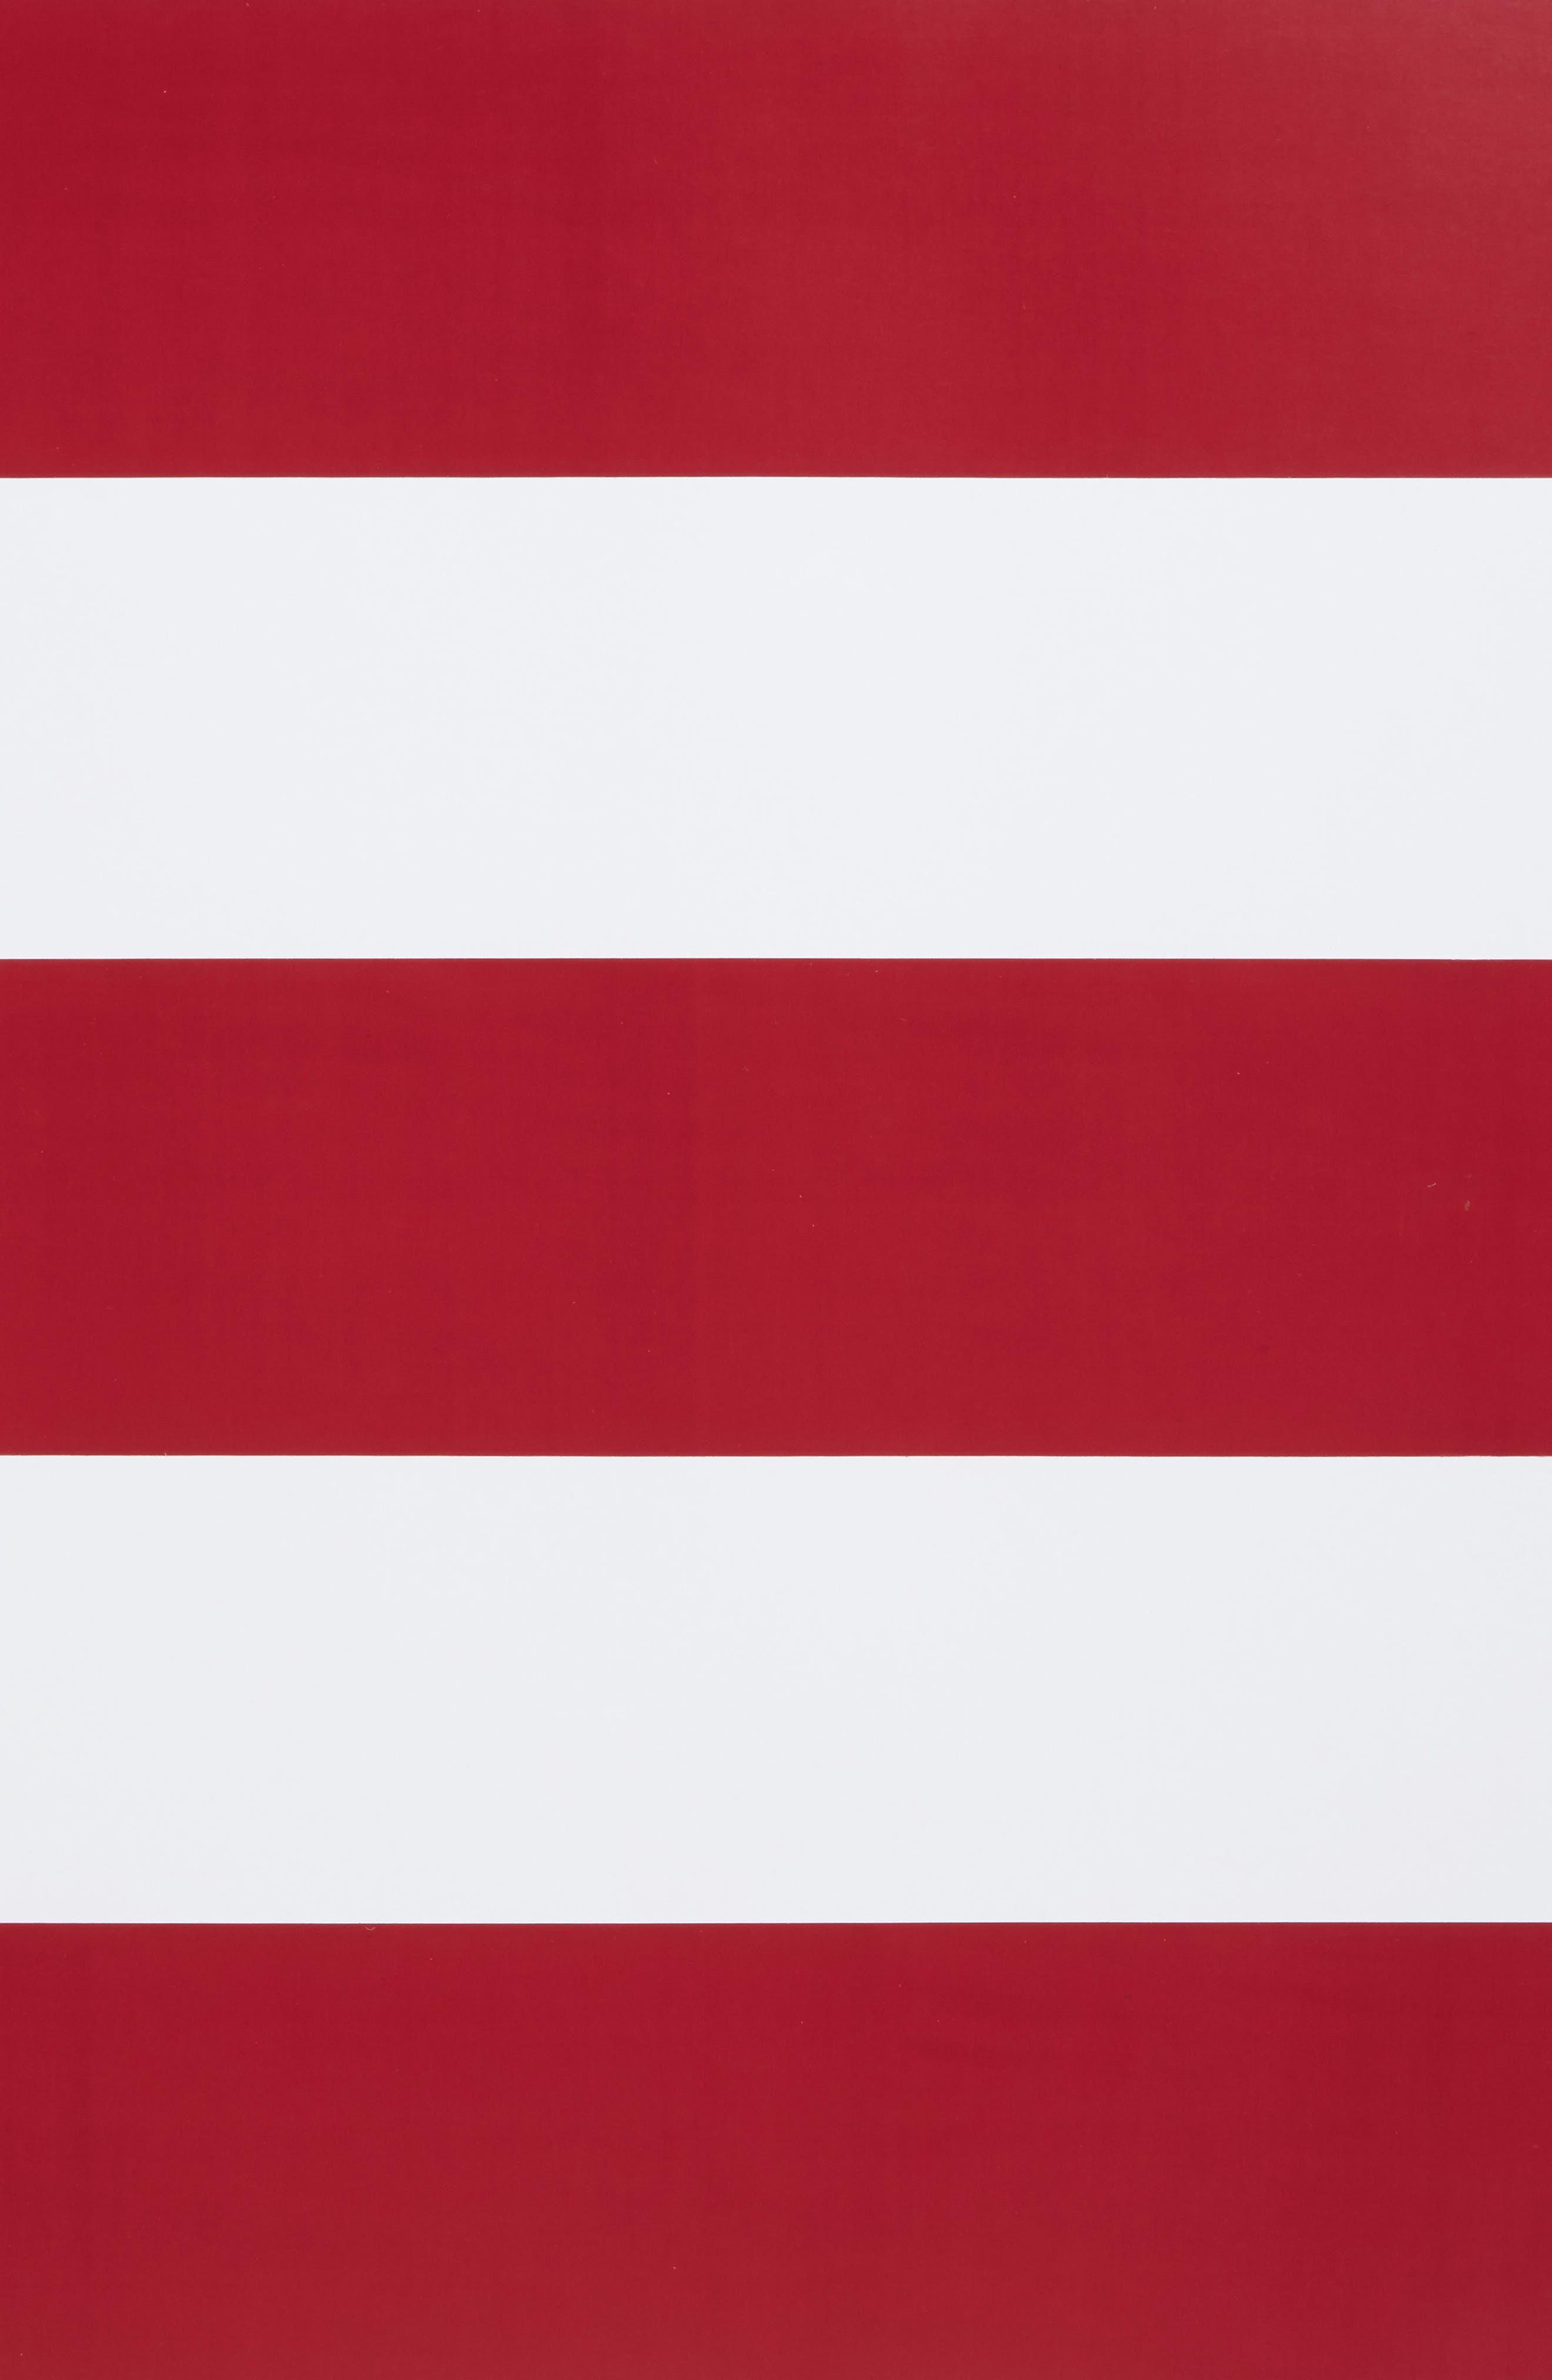 Dark Red  Peel & Stick Vinyl Stripes,                             Alternate thumbnail 3, color,